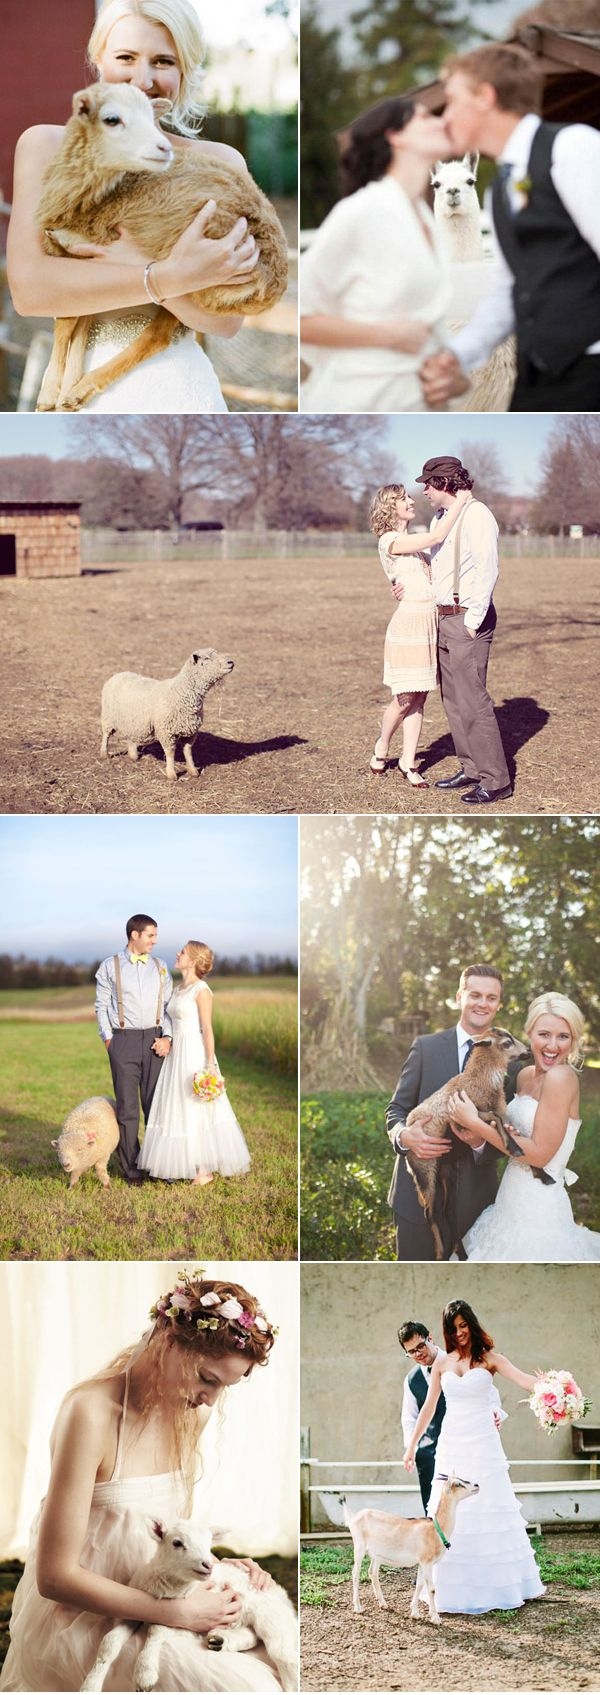 Lovely Farm Wedding Animals - sheep & goat family